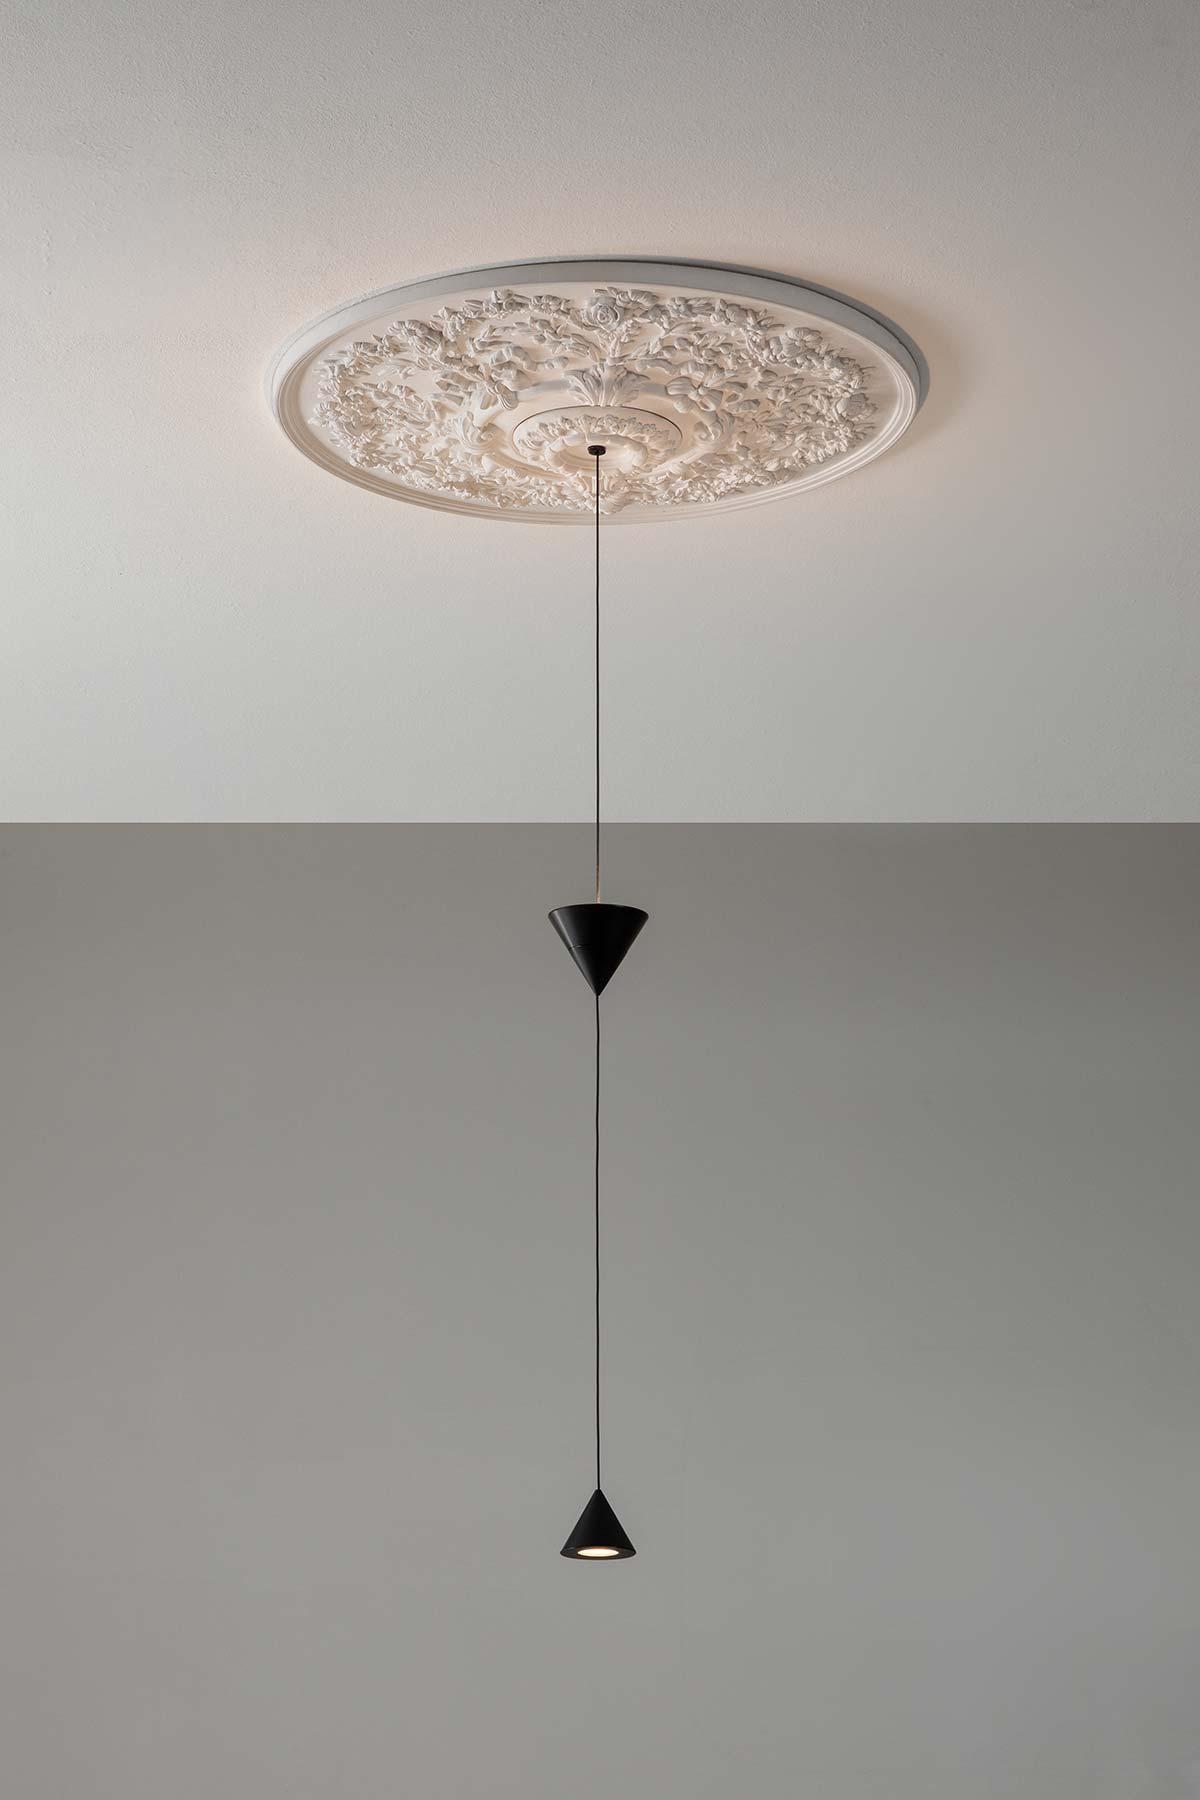 Moonbloom by Karman, Design Matteo Ugolini